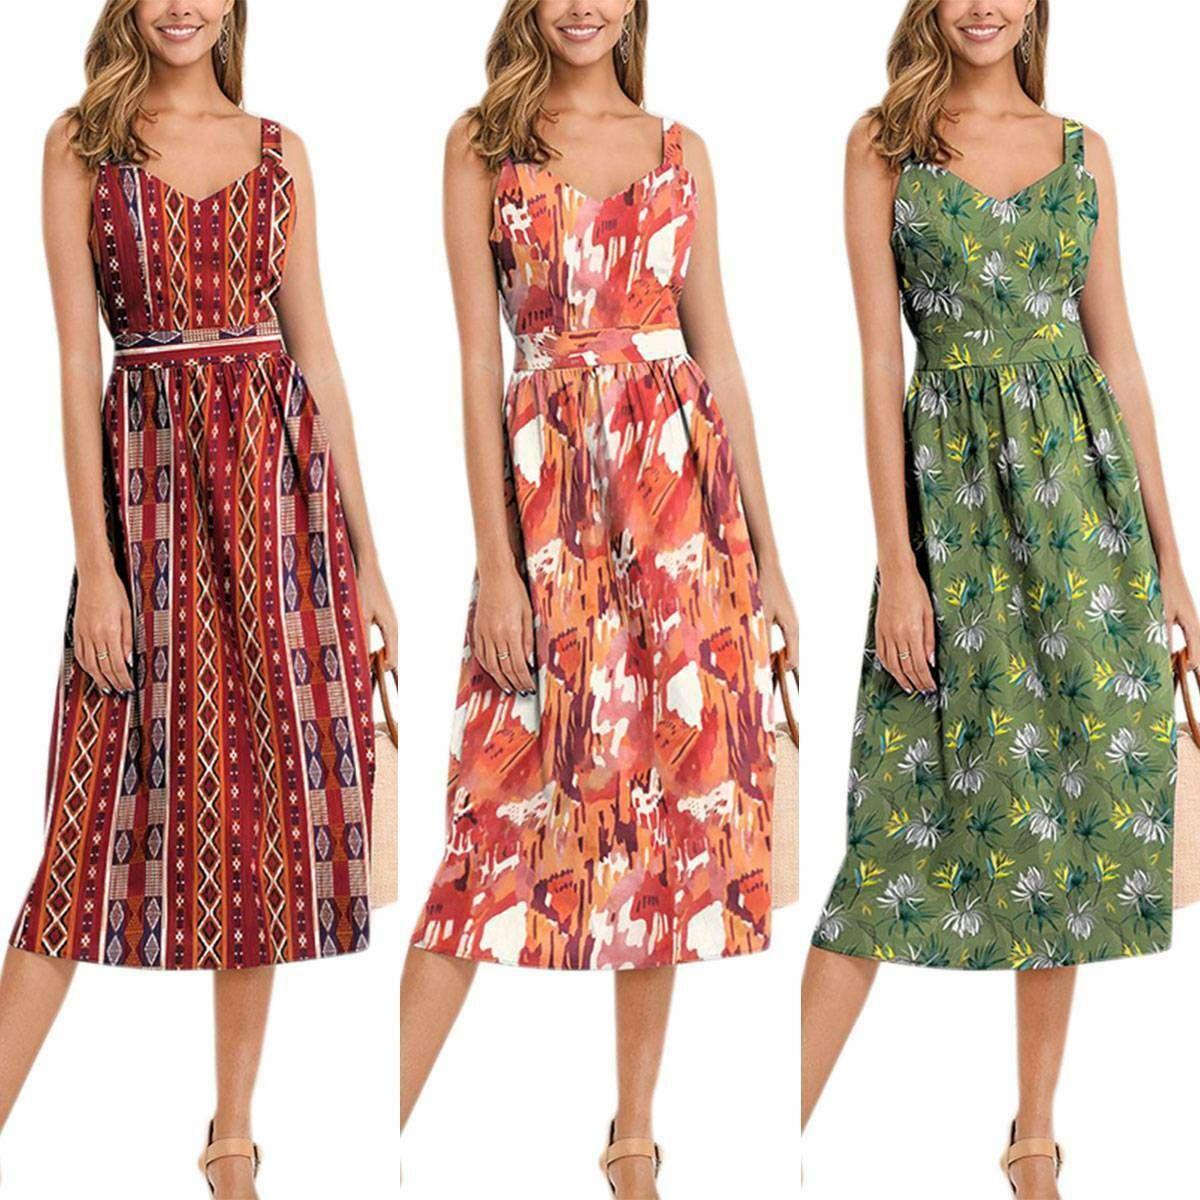 Boho Women Floral V Neck Cami Sleeveless Swing Midi Dress Holiday Party Clubwear Floral Dresses Sho Midi Dress Sleeveless Midi Swing Dress Clubwear Dresses [ 1200 x 1200 Pixel ]